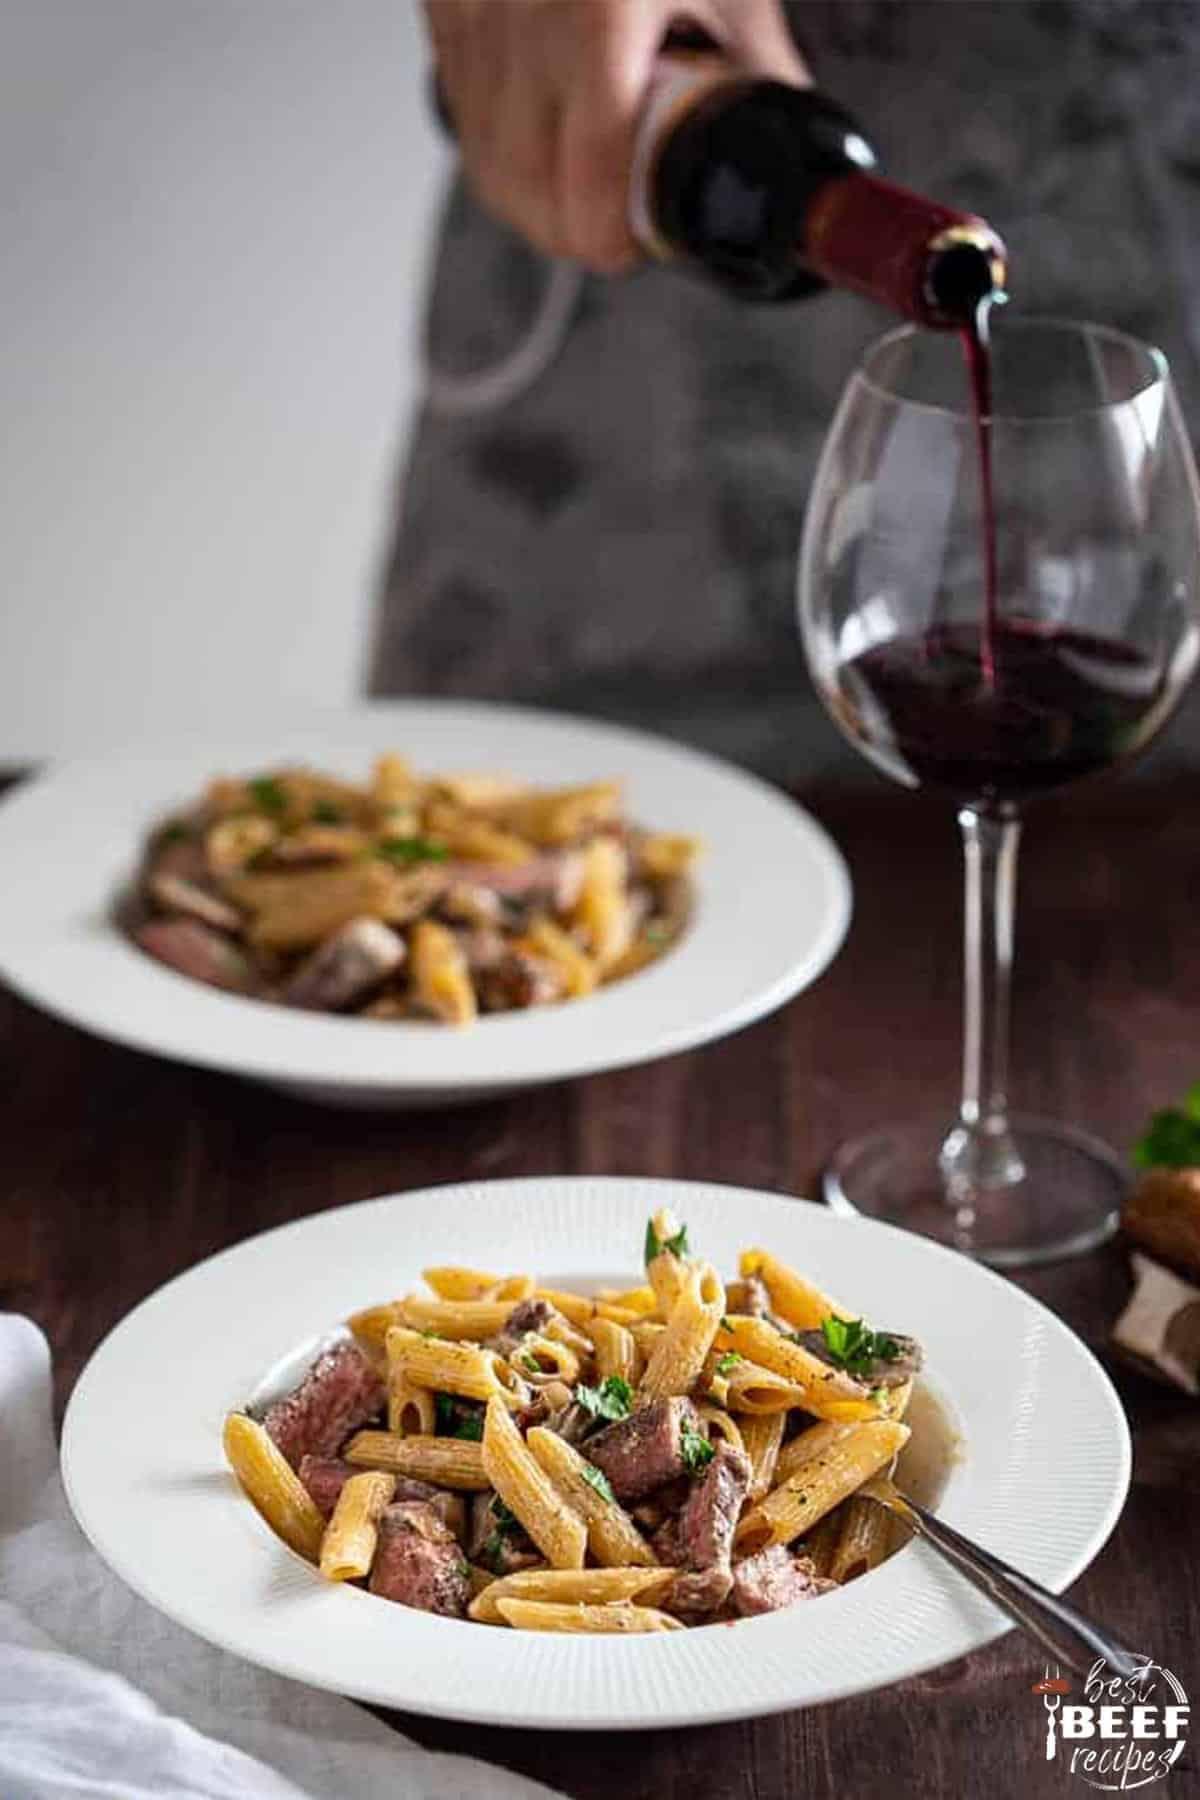 pouring wine next to two plates of leftover prime rib pasta